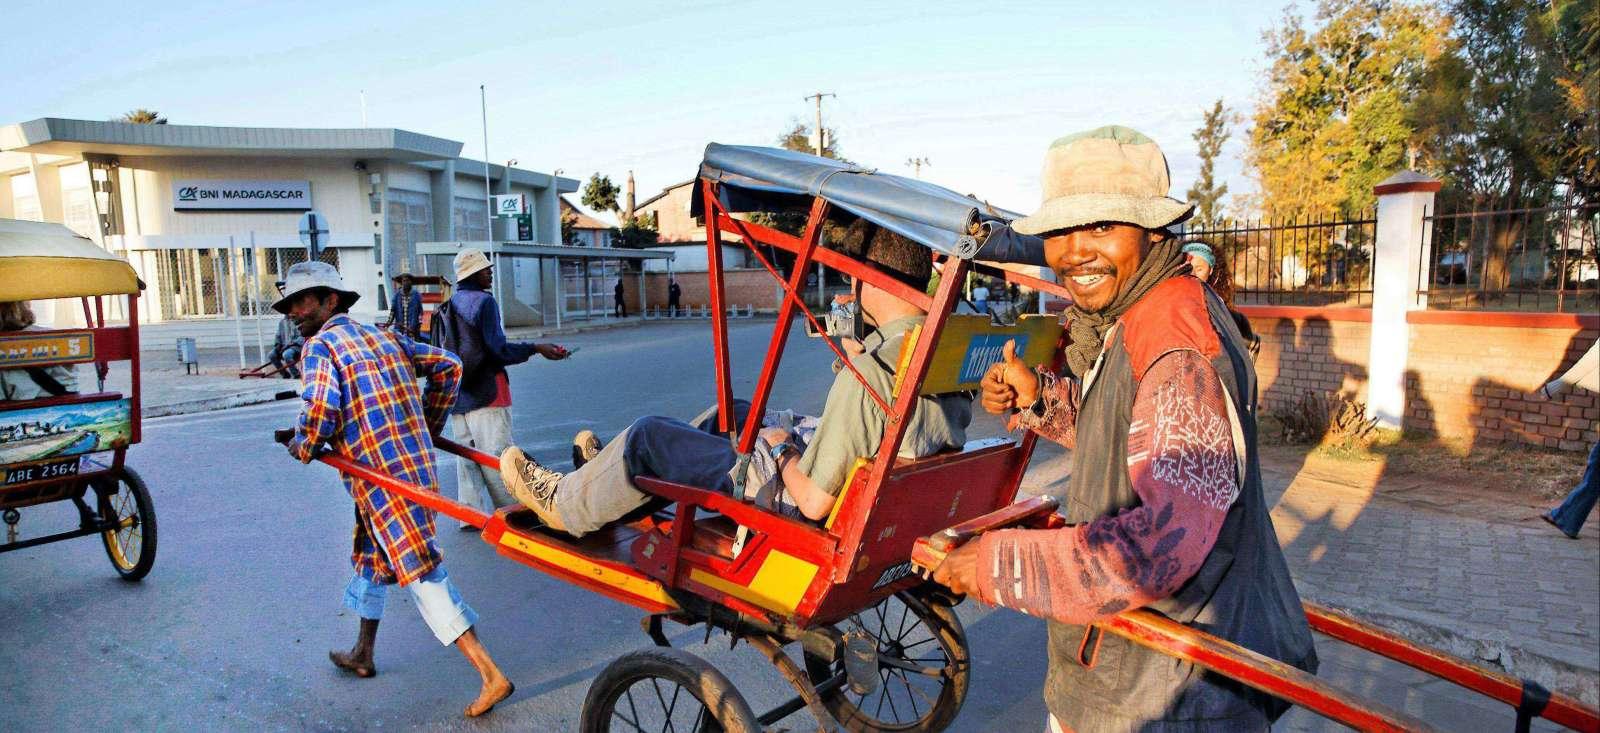 Voyage à pied Madagascar : Best of Mada !